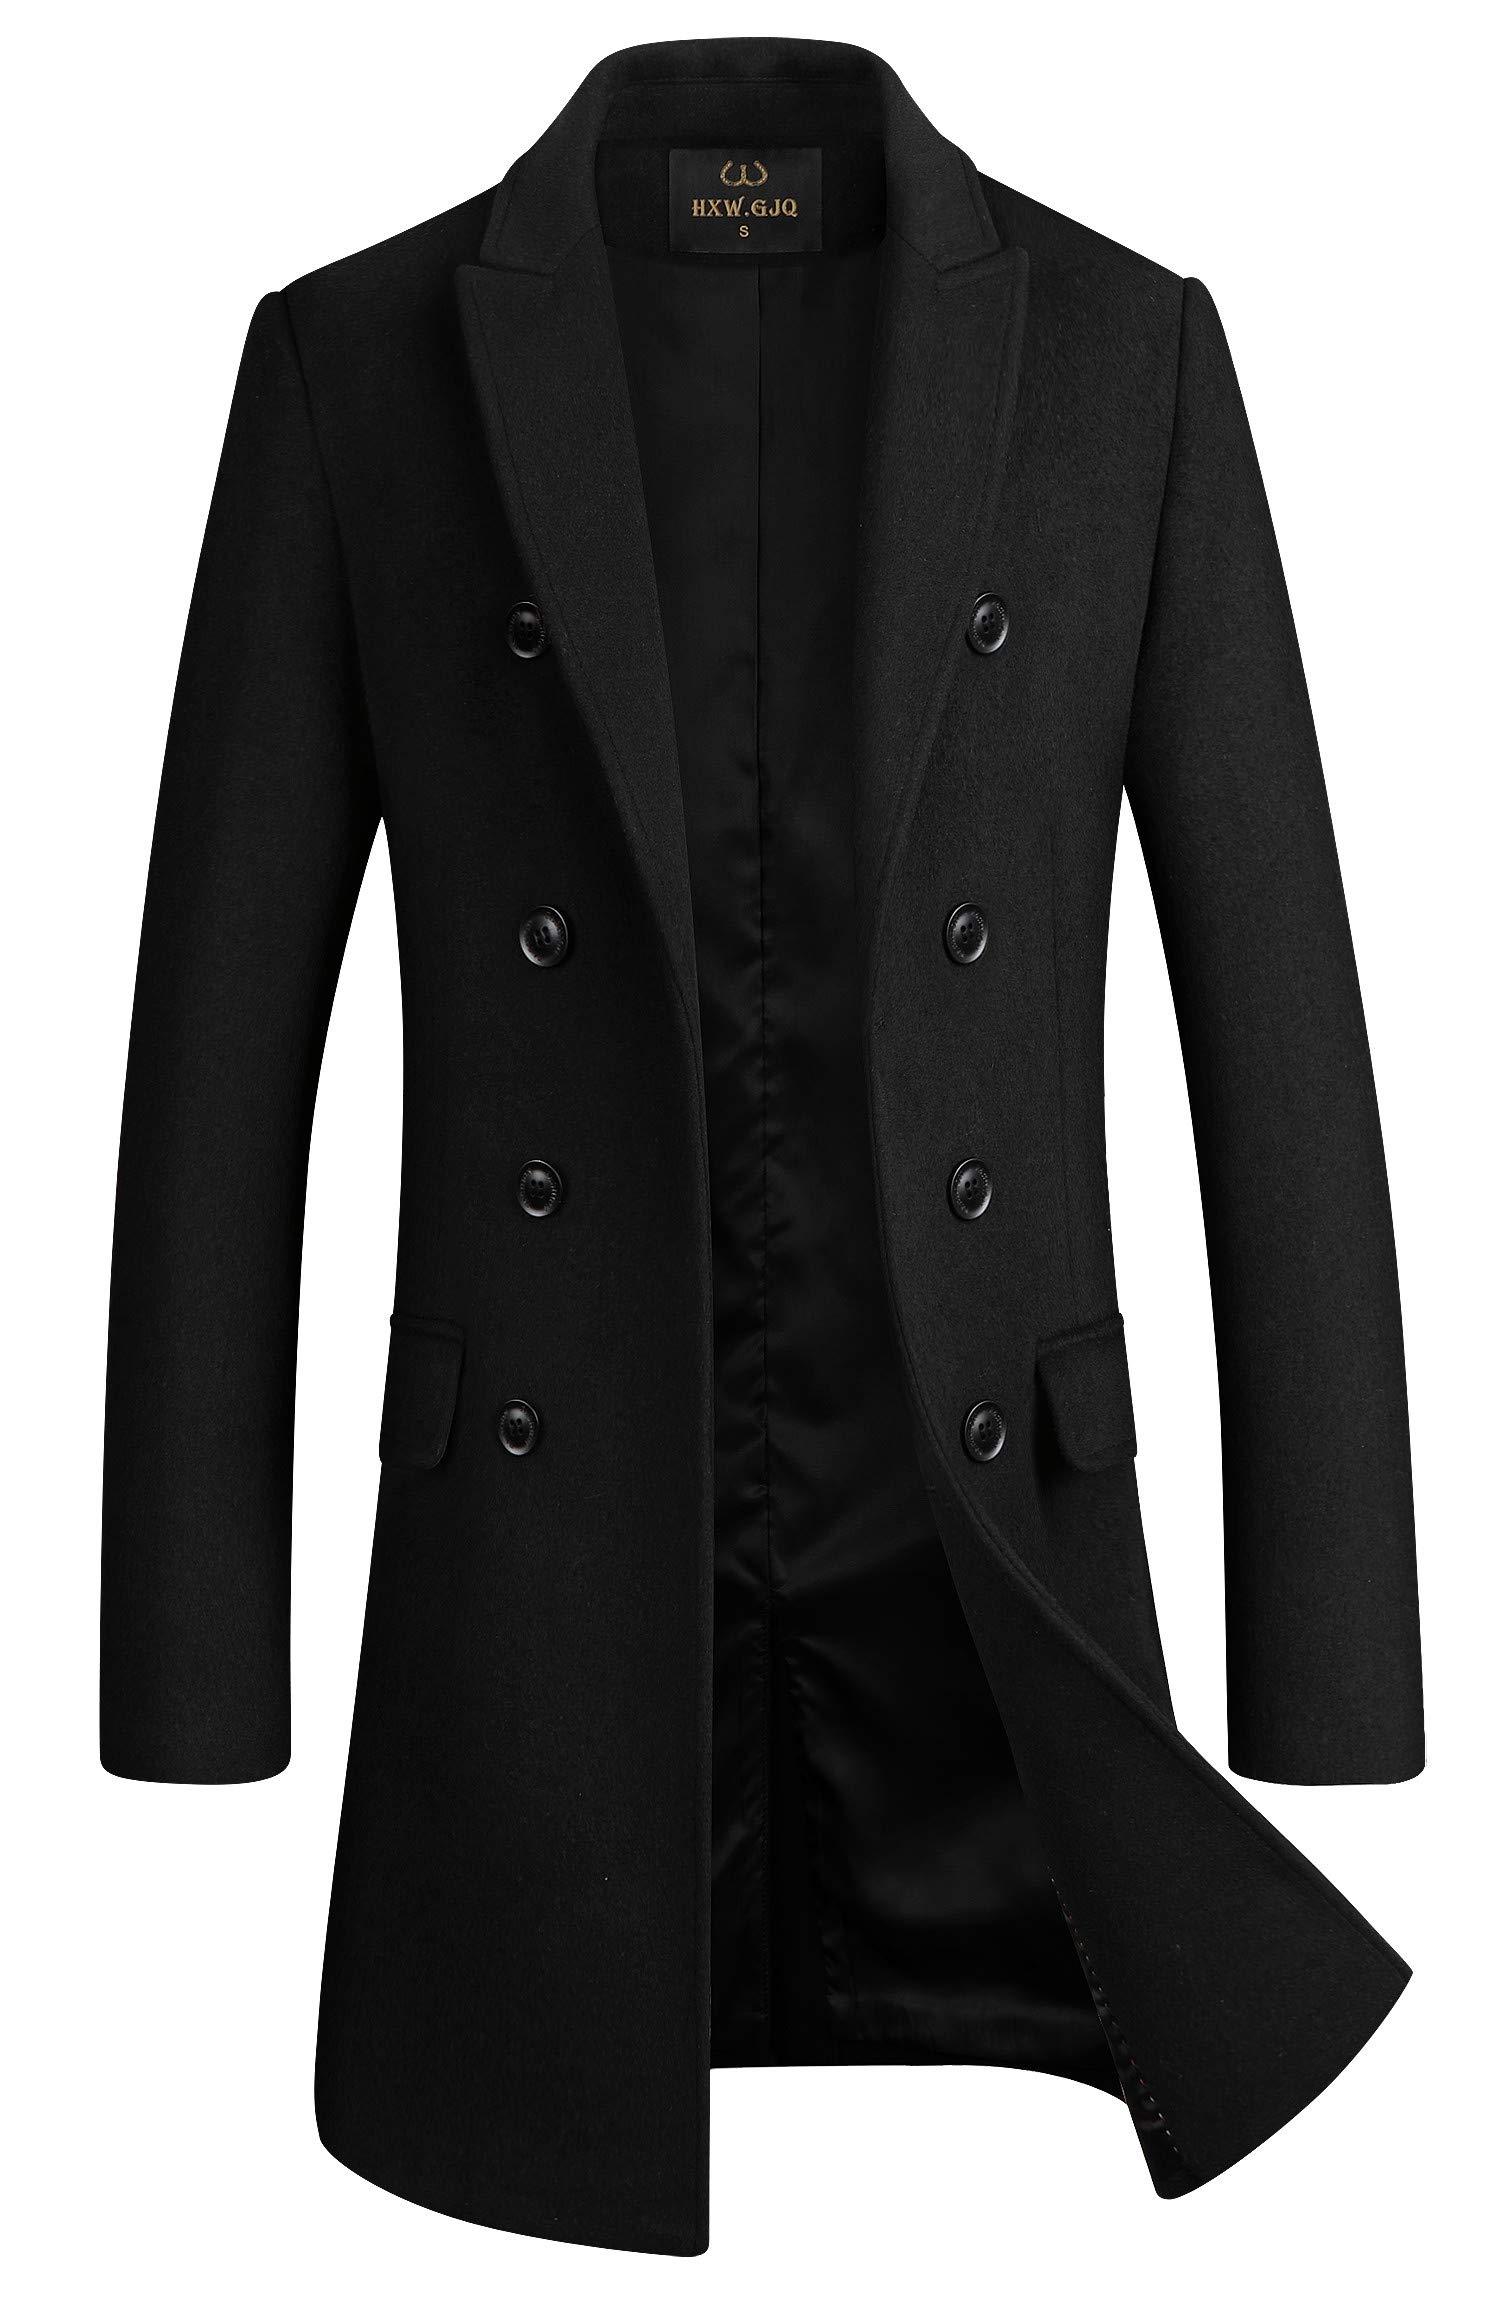 Men's Premium Wool Blend Double Breasted Long Pea Coat (Black, Medium) by HXW.GJQ